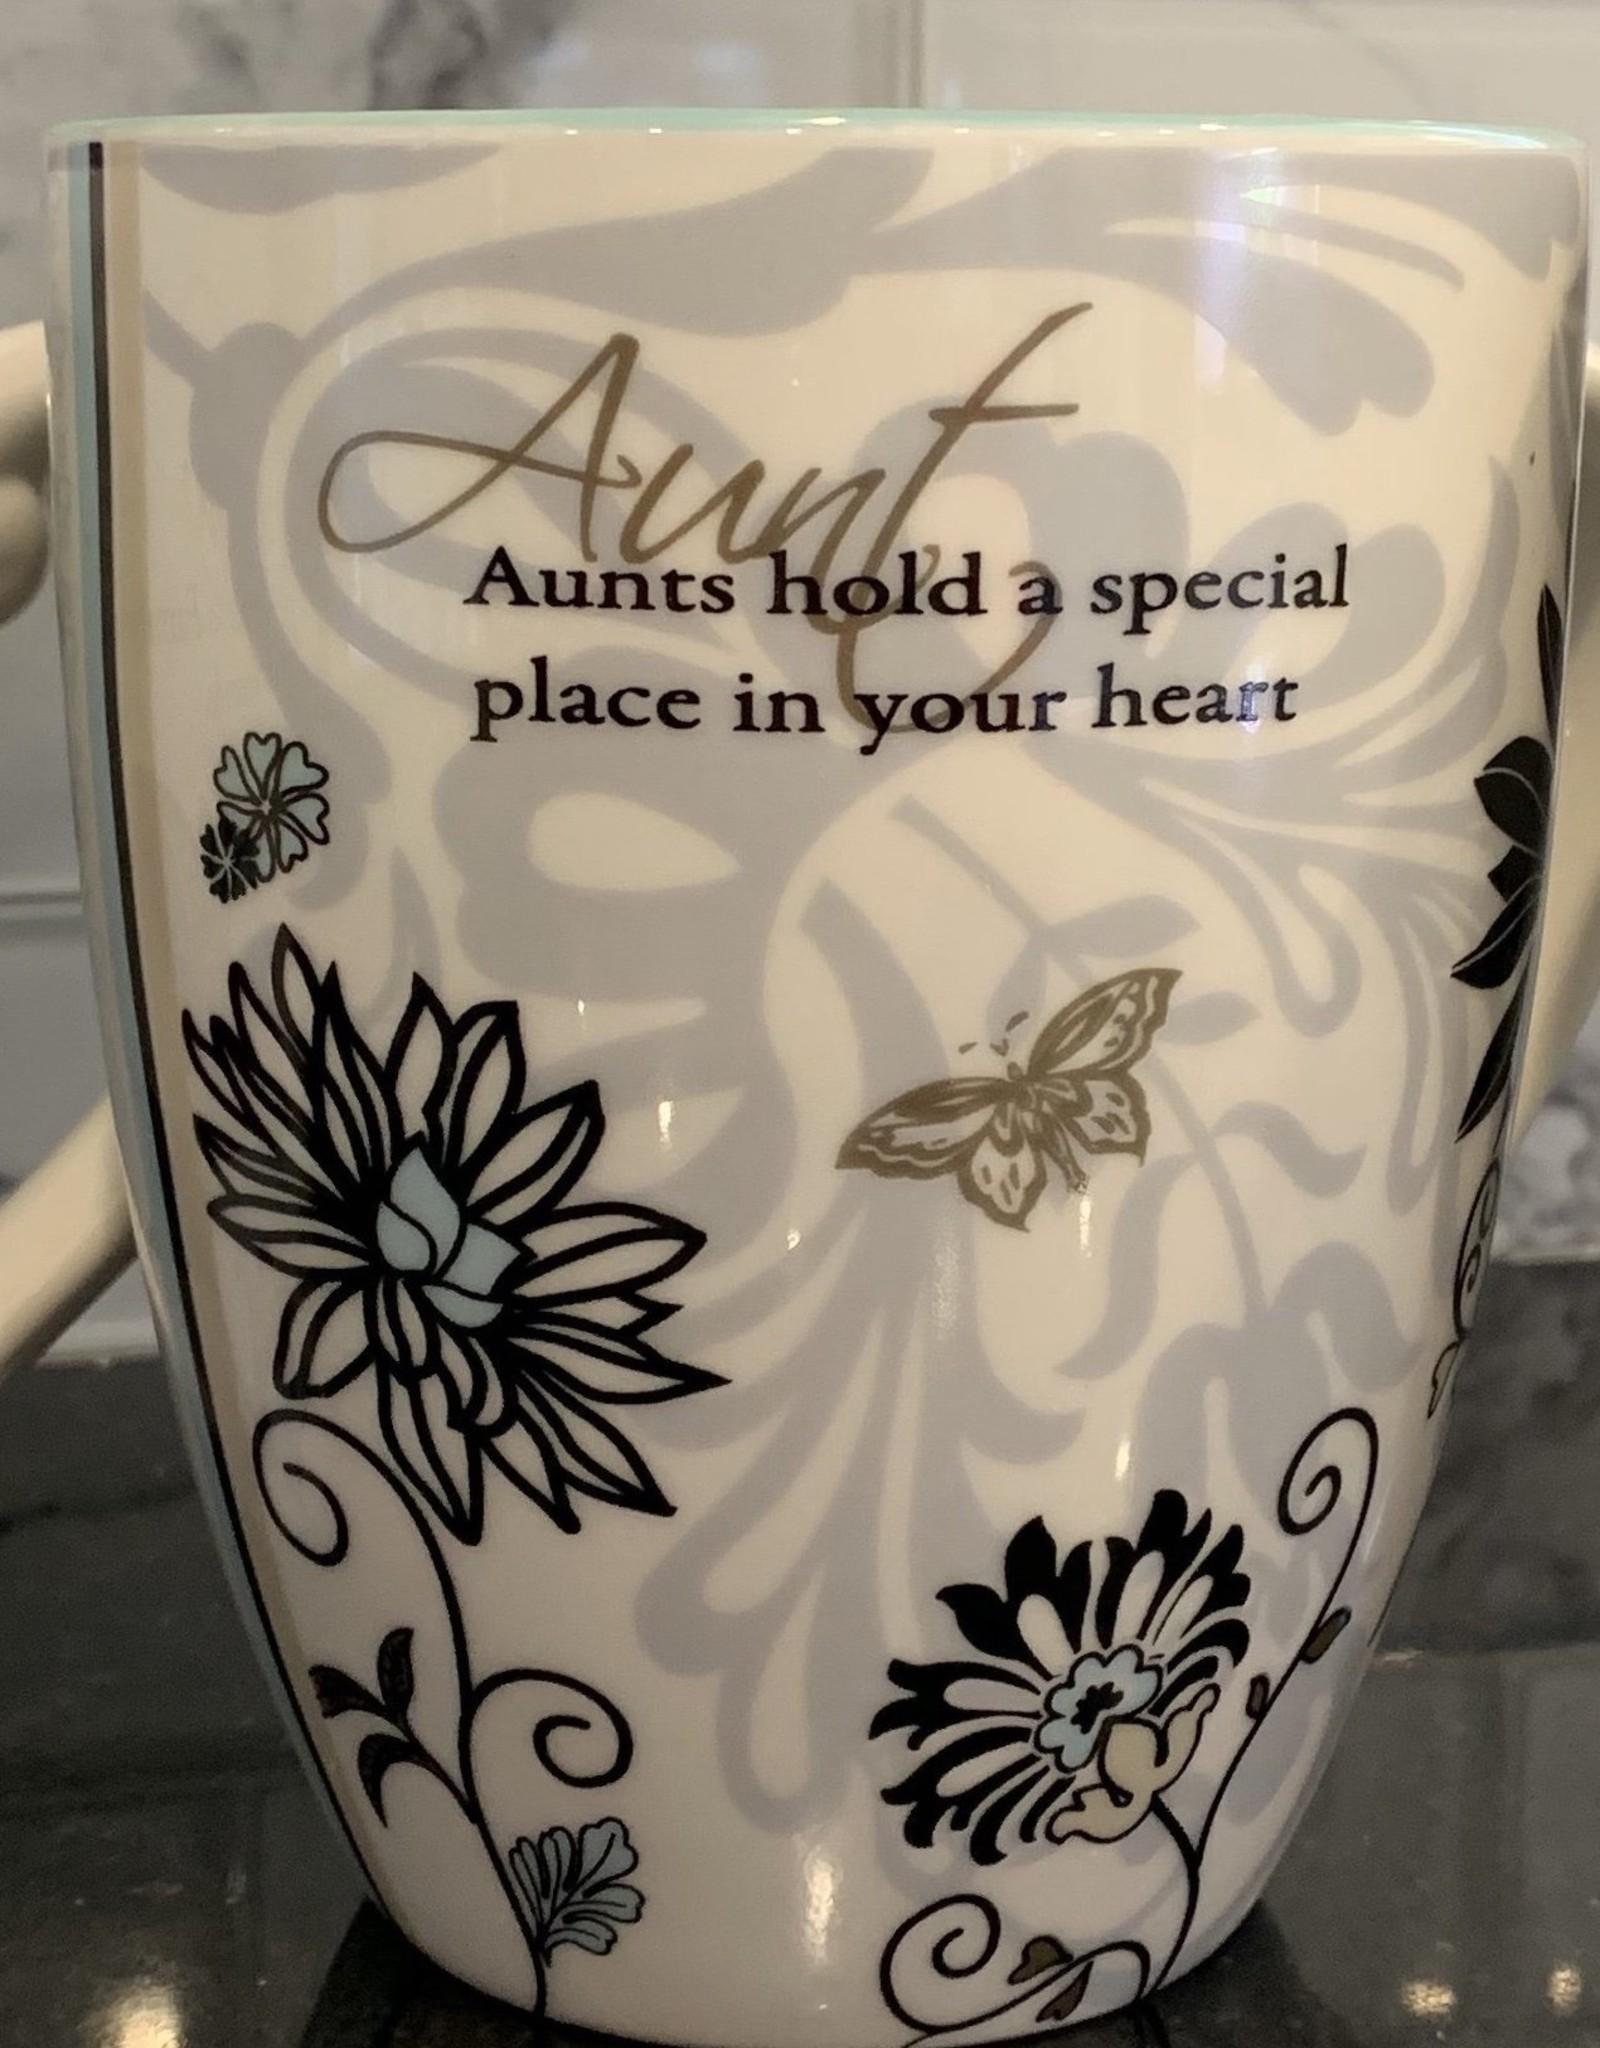 PAVILION Sentiment Coffee Mugs - Family